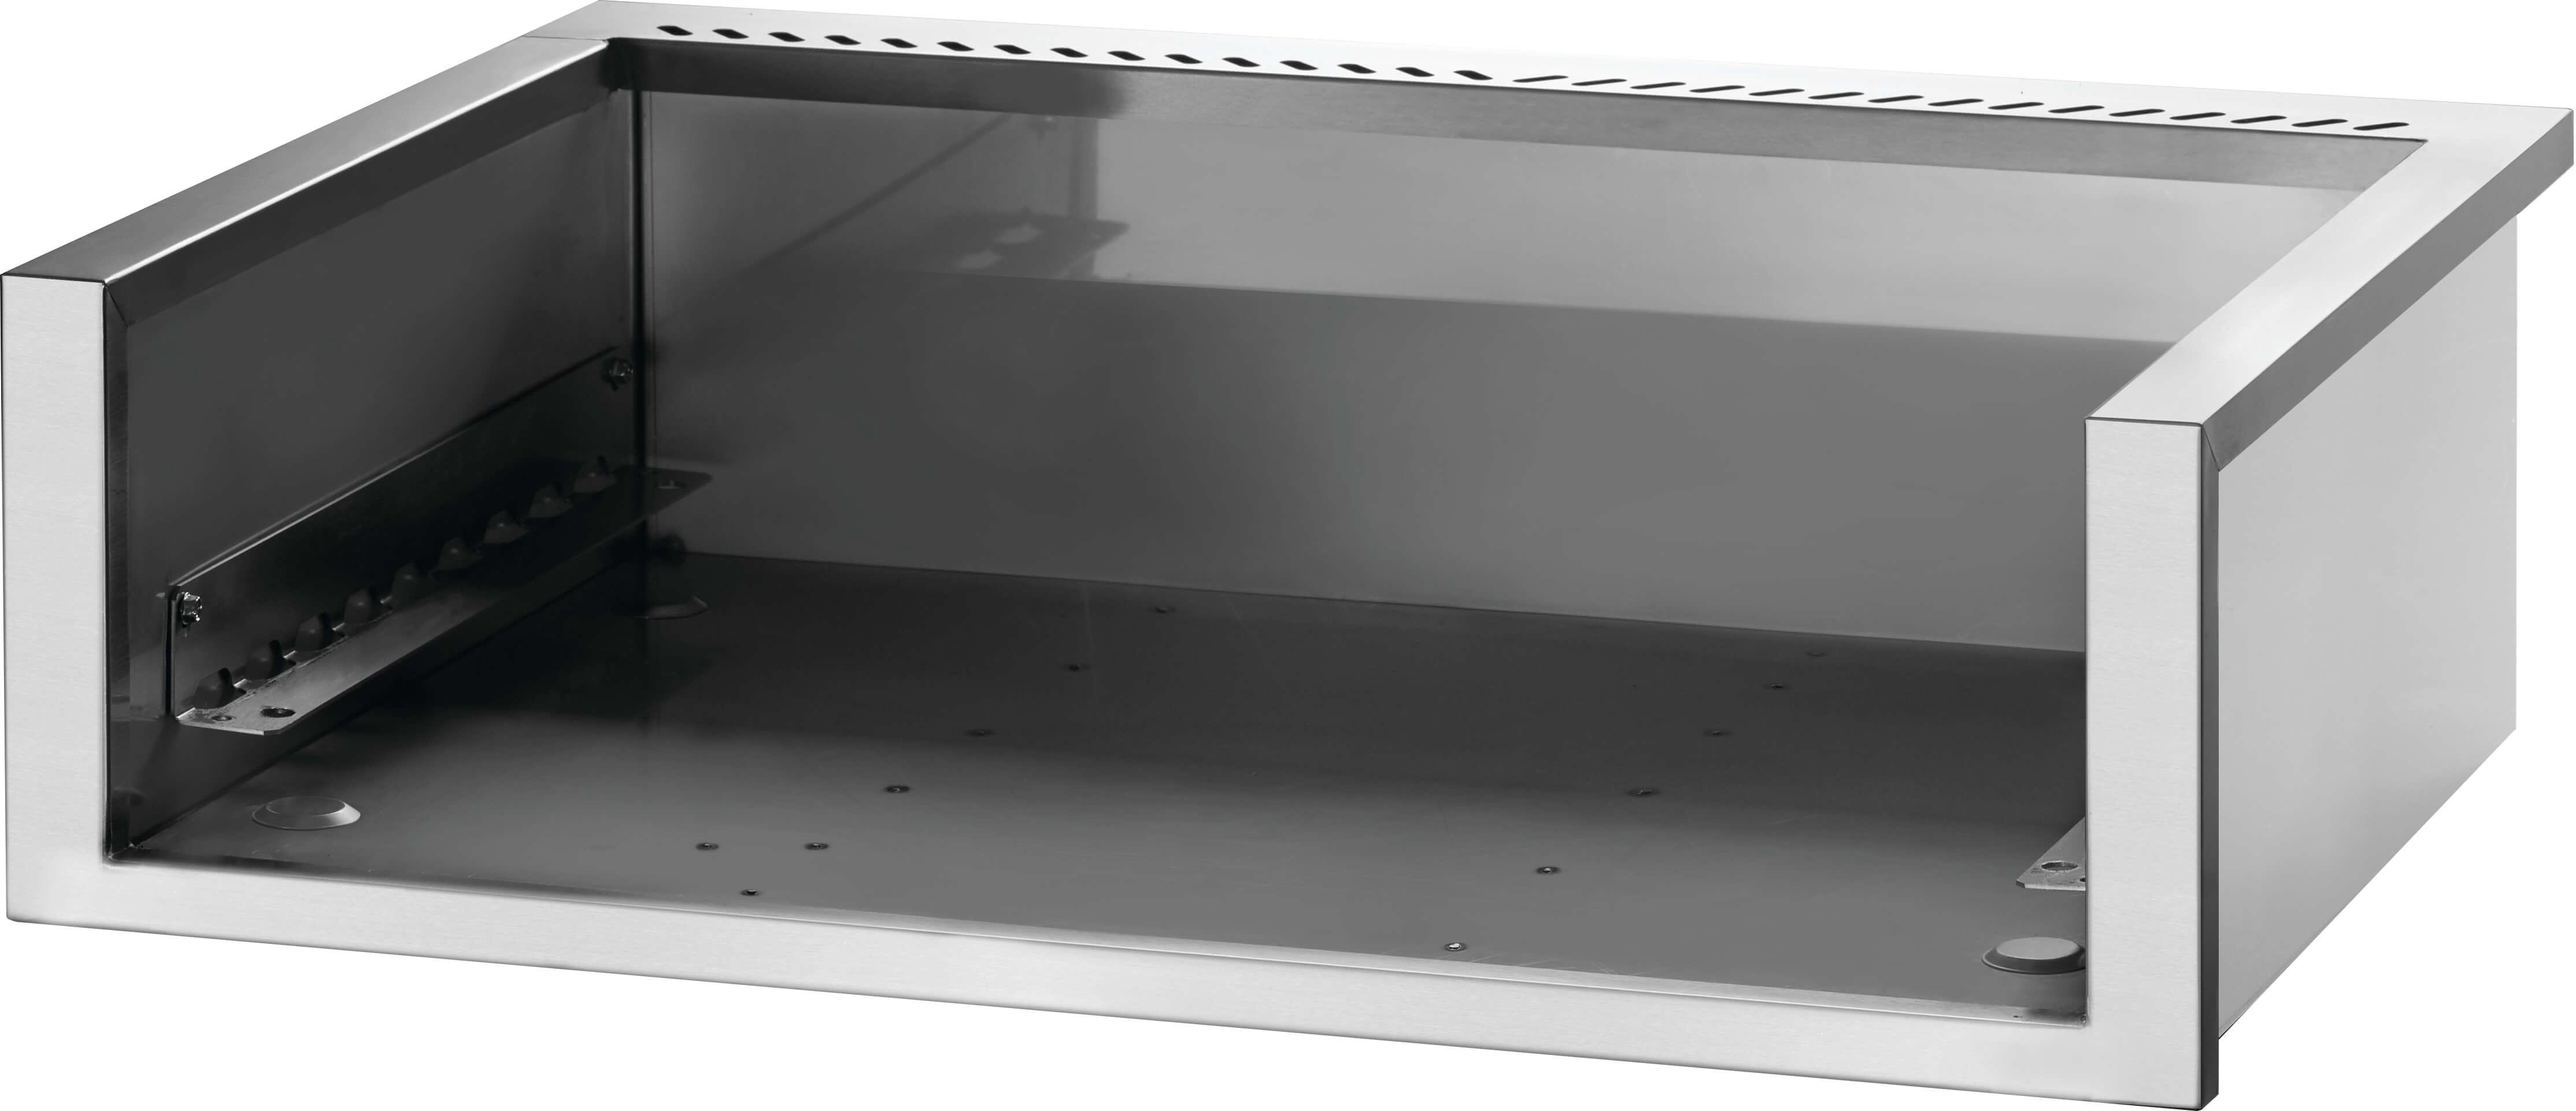 Zero Clearance Liner LEX485 / P500